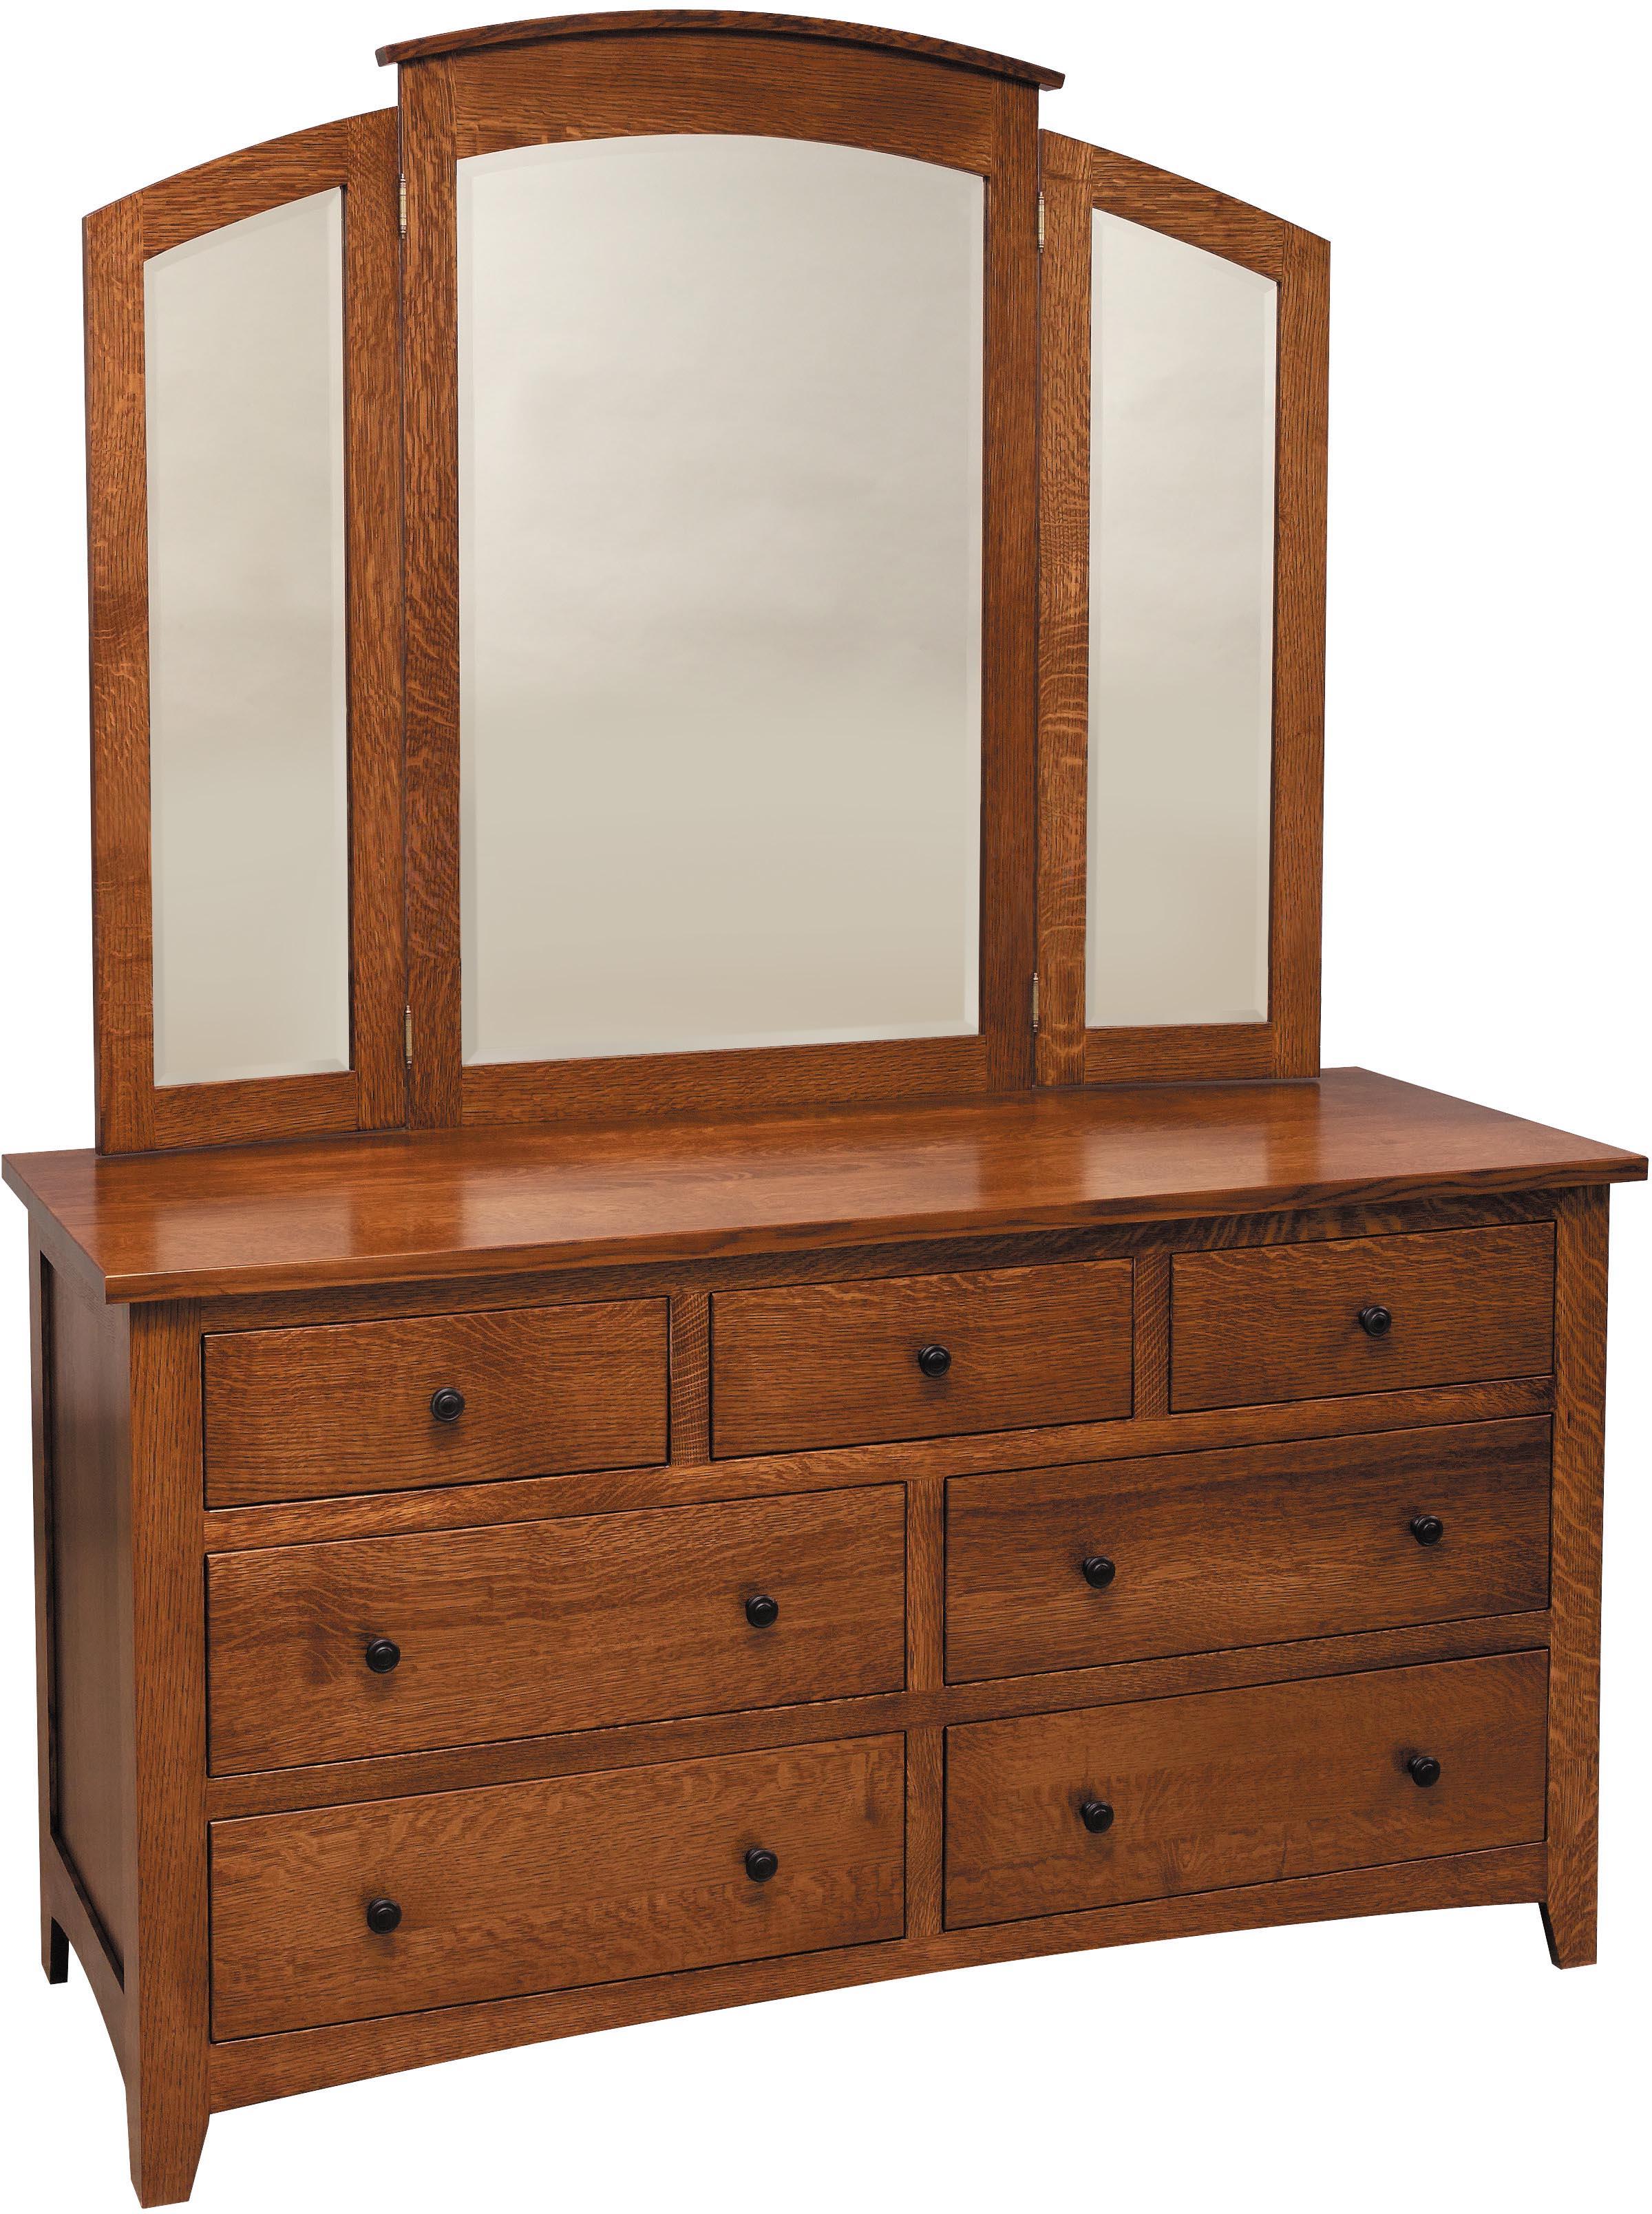 Mercea, PA dresser for sale